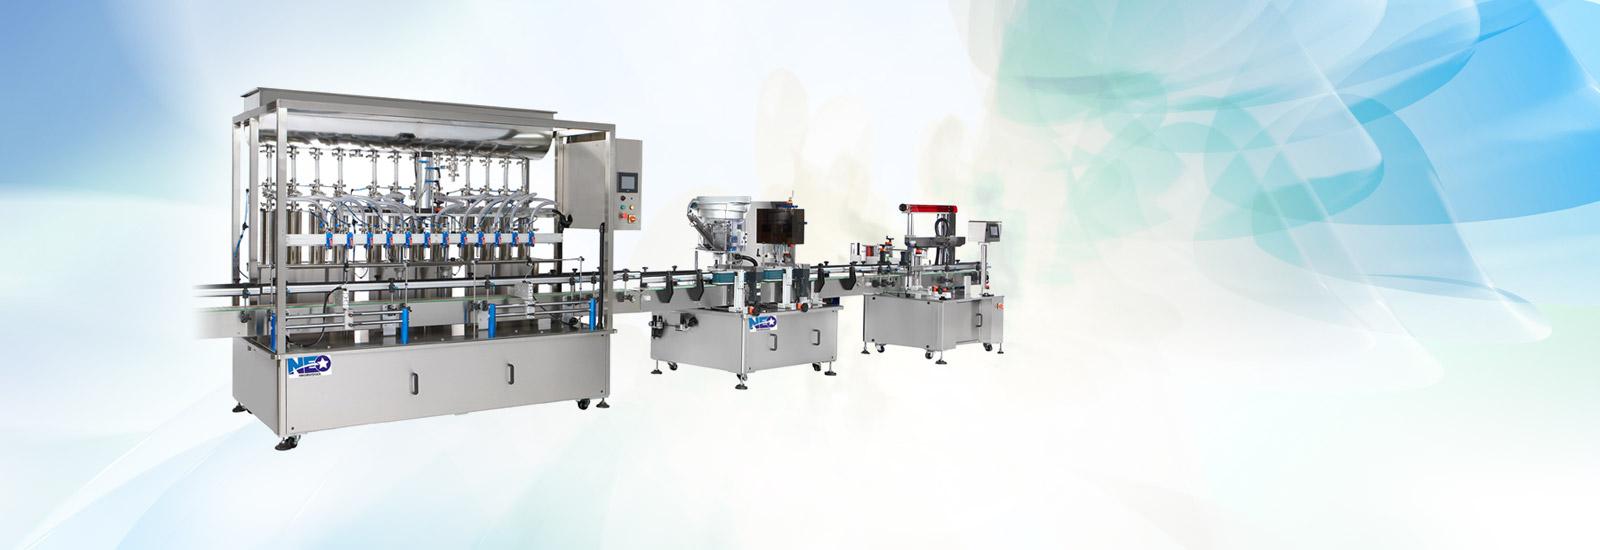 Machine d'emballage Fabricant Remplissage Capsuleuse Ligne